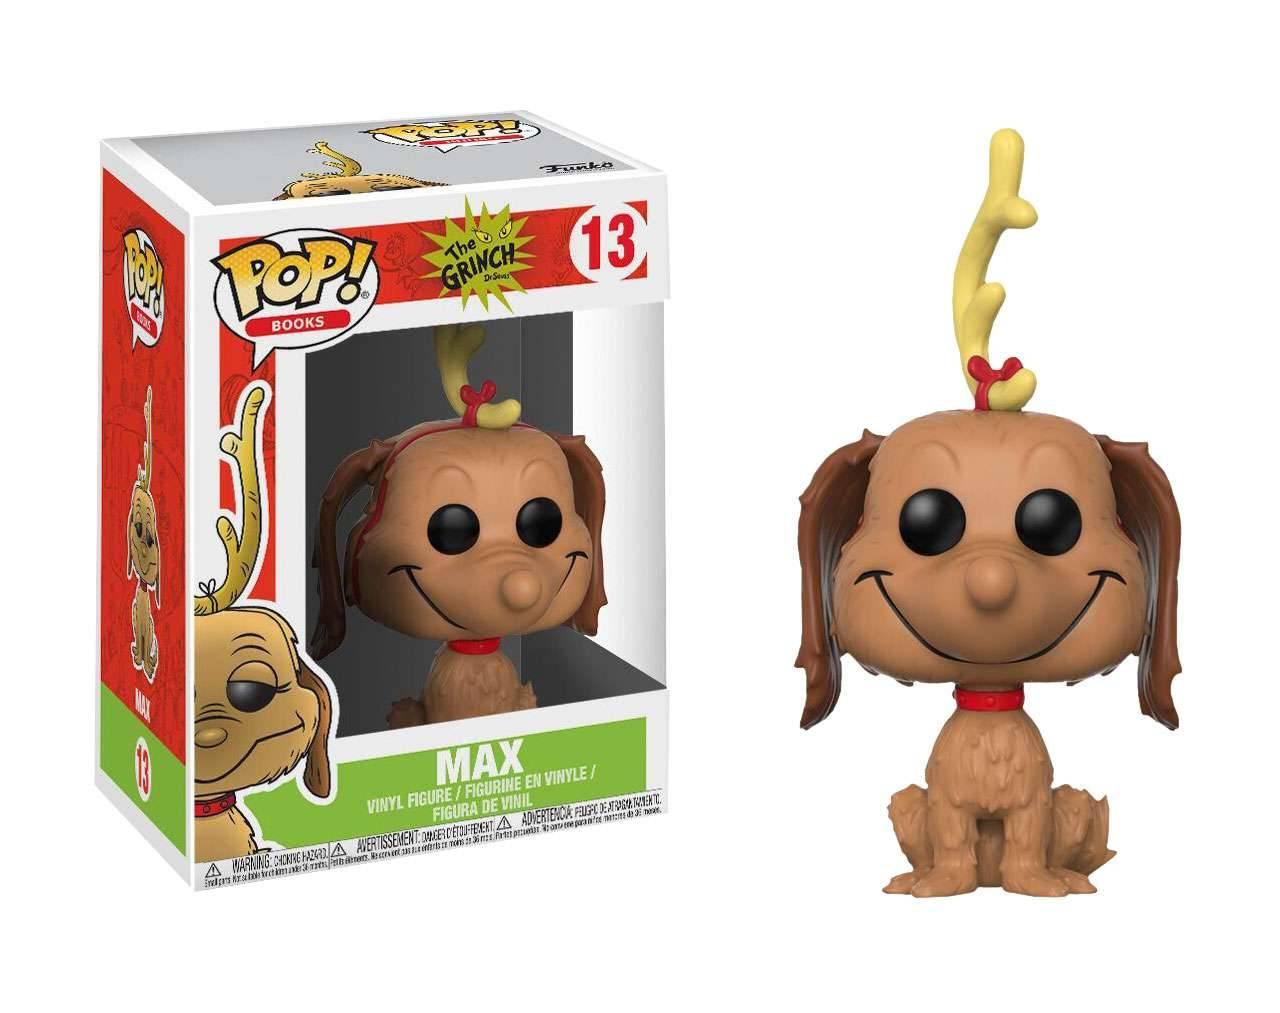 Max (Grinch) Pop! Vinyl